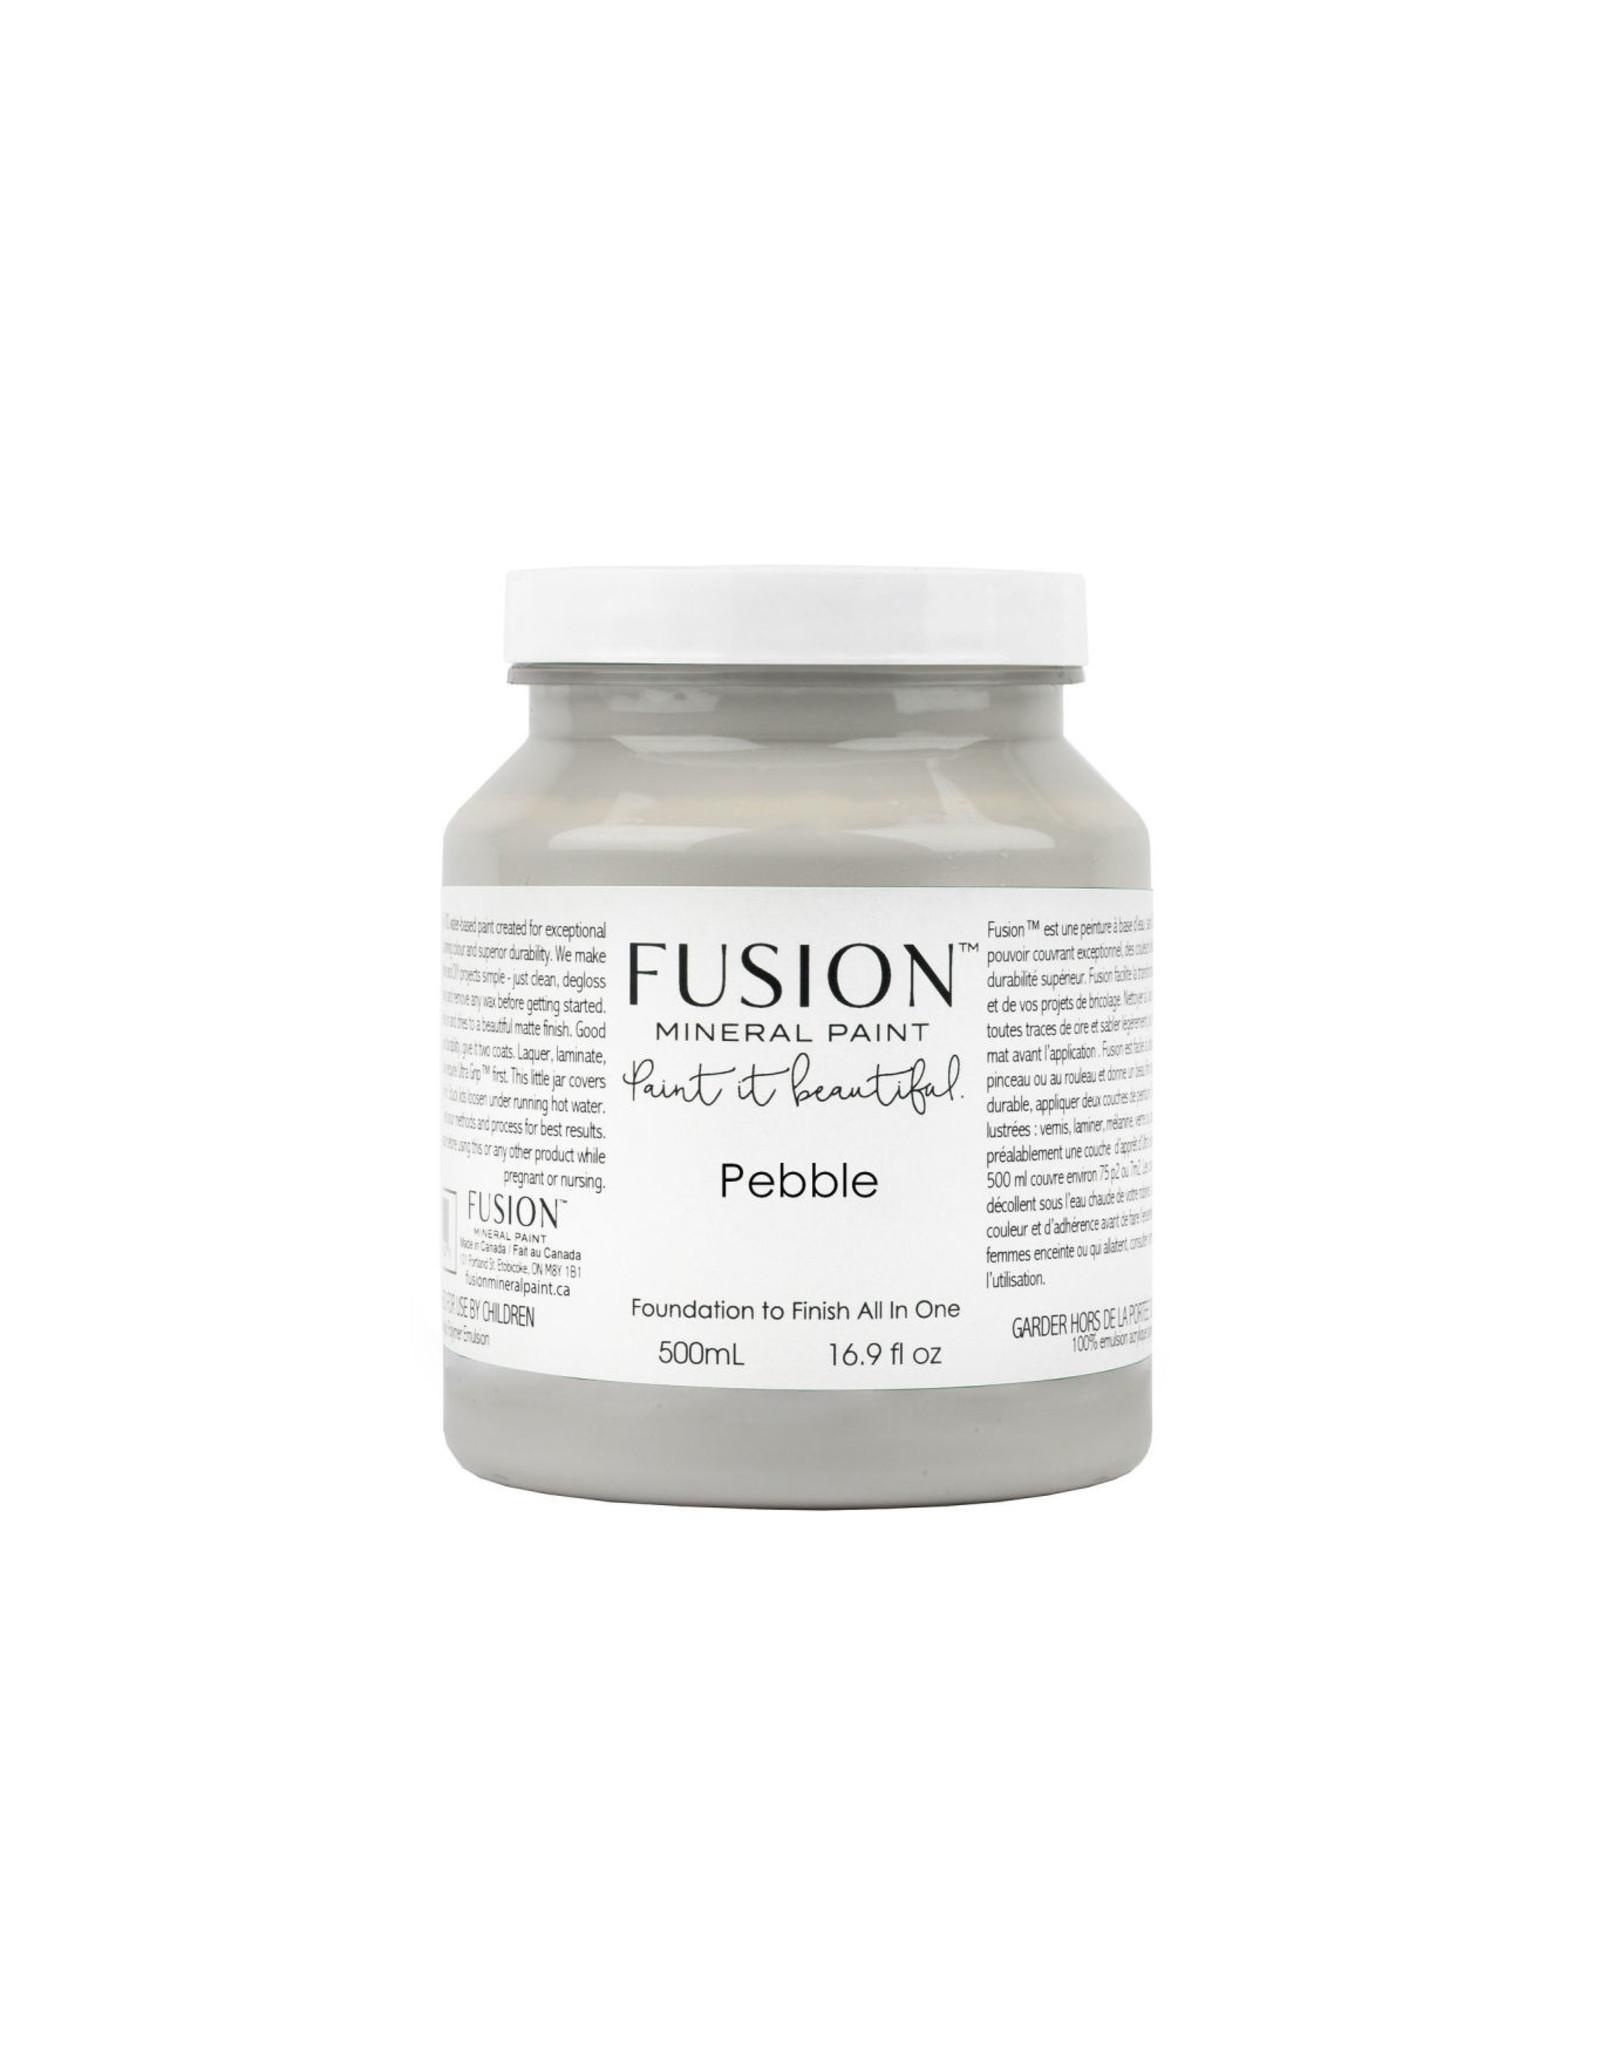 Fusion Mineral Paint Fusion Mineral Paint - Pebble 500ml